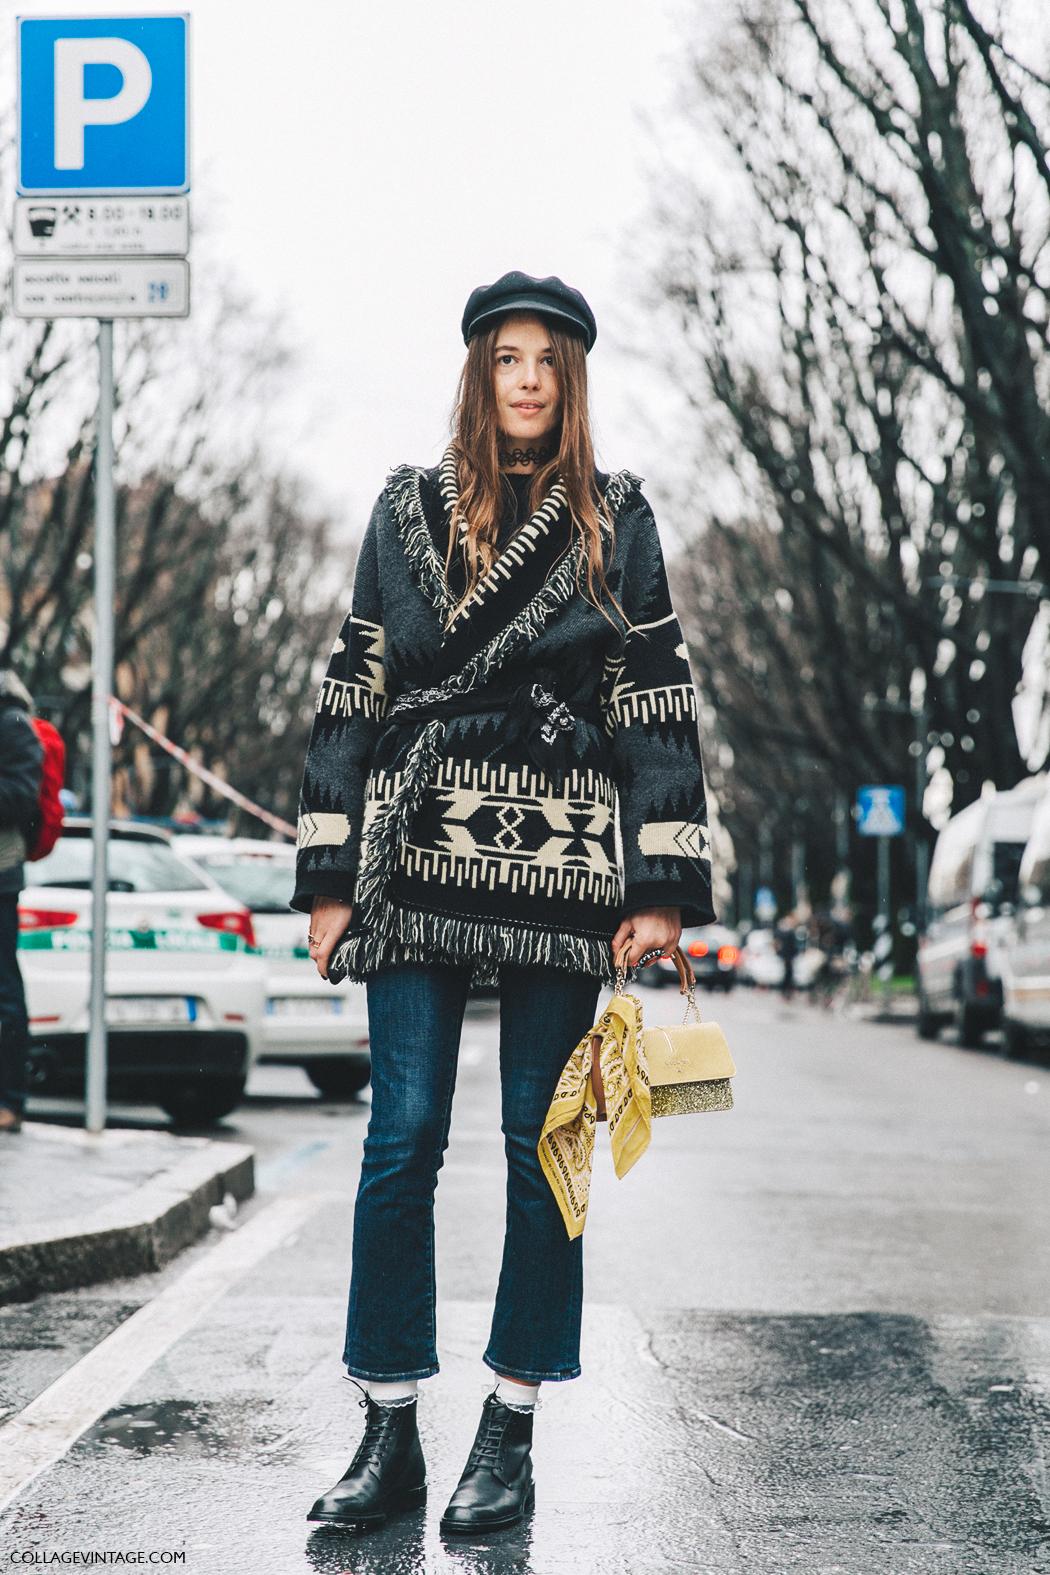 Milan_Fashion_Week_Fall_16-MFW-Street_Style-Collage_Vintage-Carlotta_Oddi-